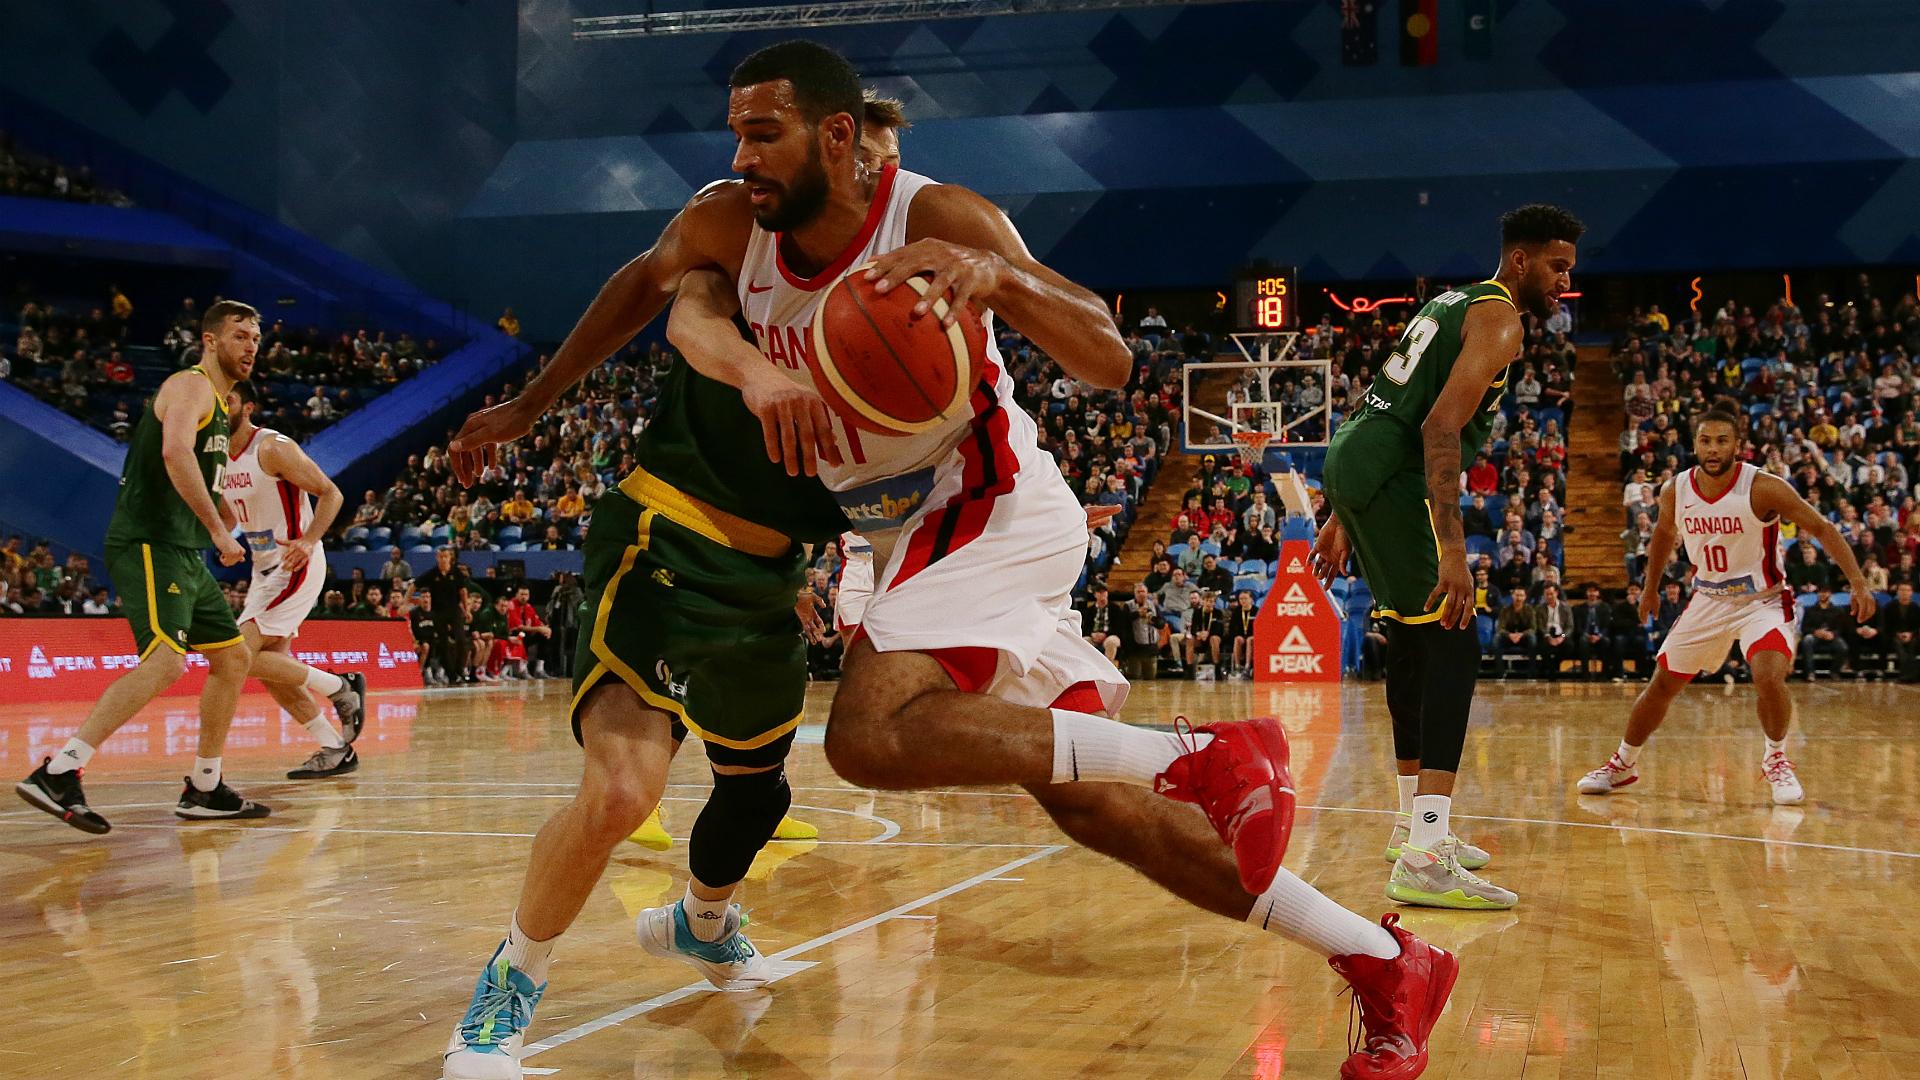 basketball world cup - photo #29